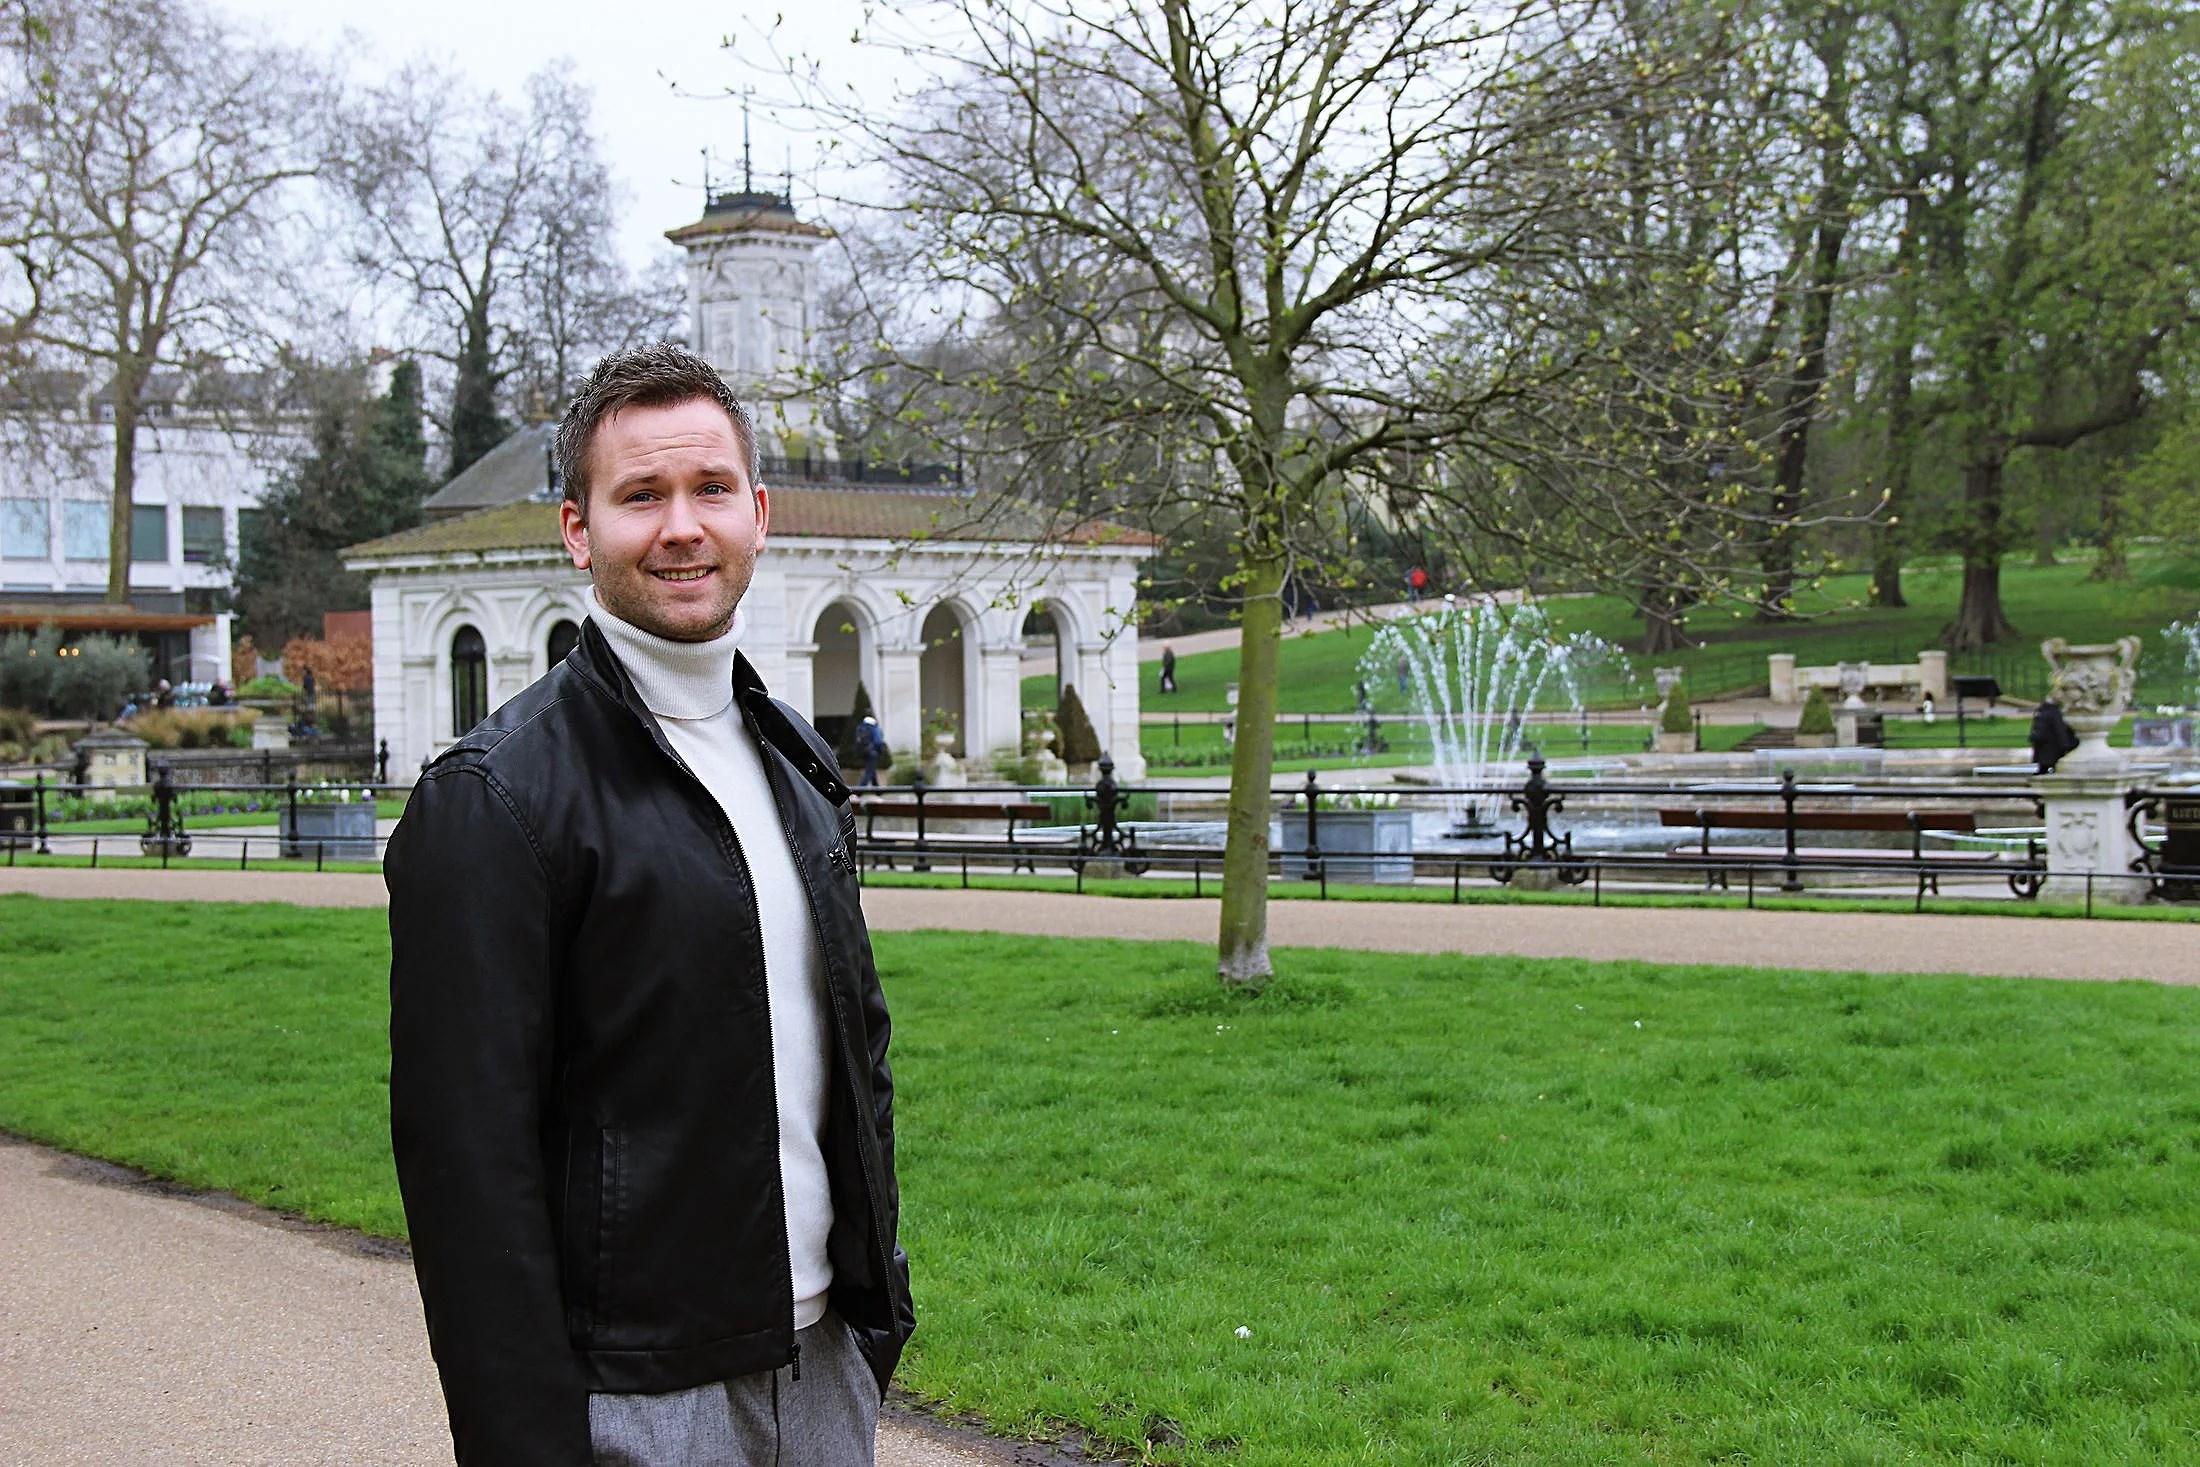 Strolling around in London